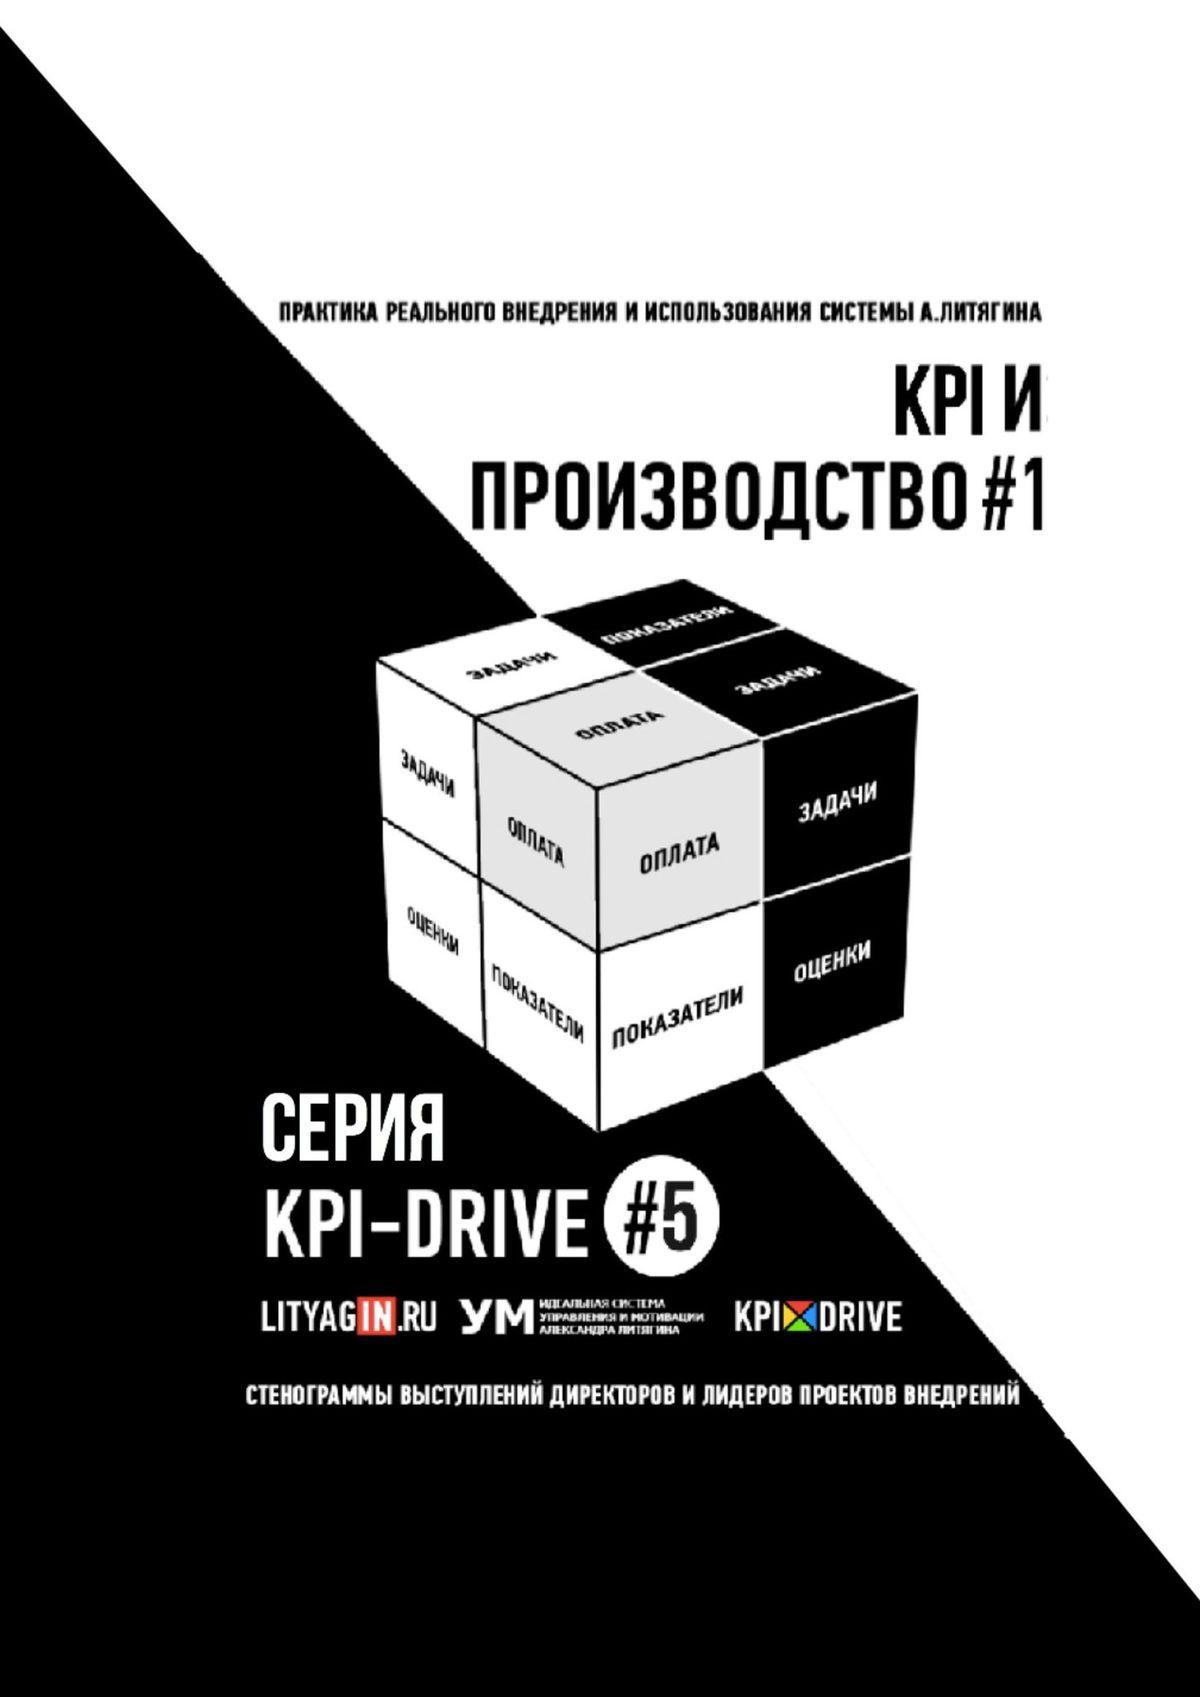 KPI-DRIVE#5. ПРОИЗВОДСТВО #1